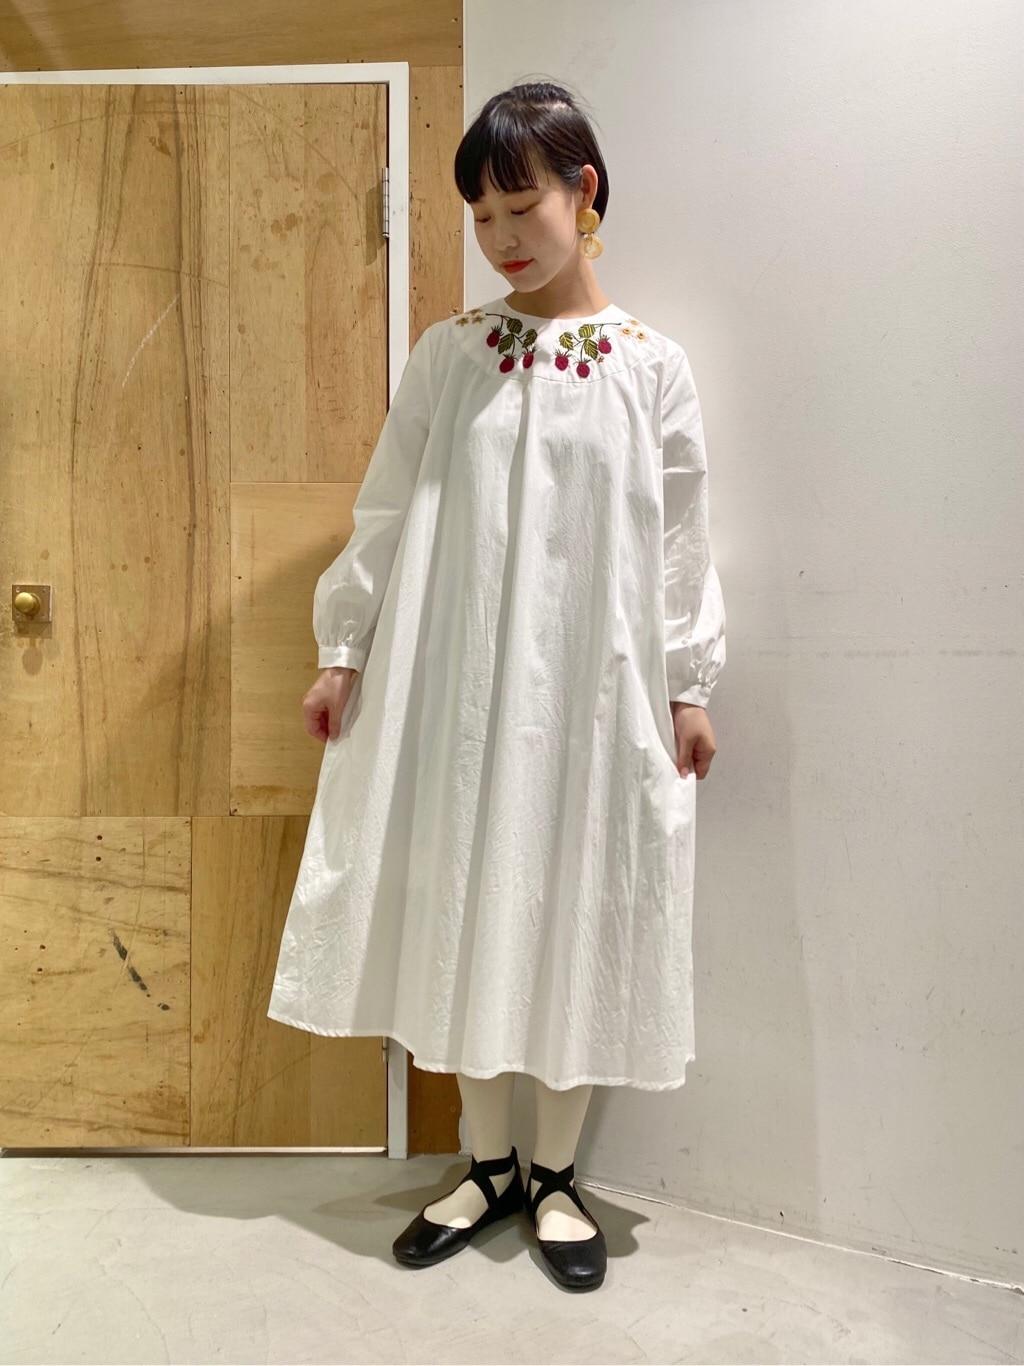 l'atelier du savon 新宿ミロード 身長:159cm 2021.01.14